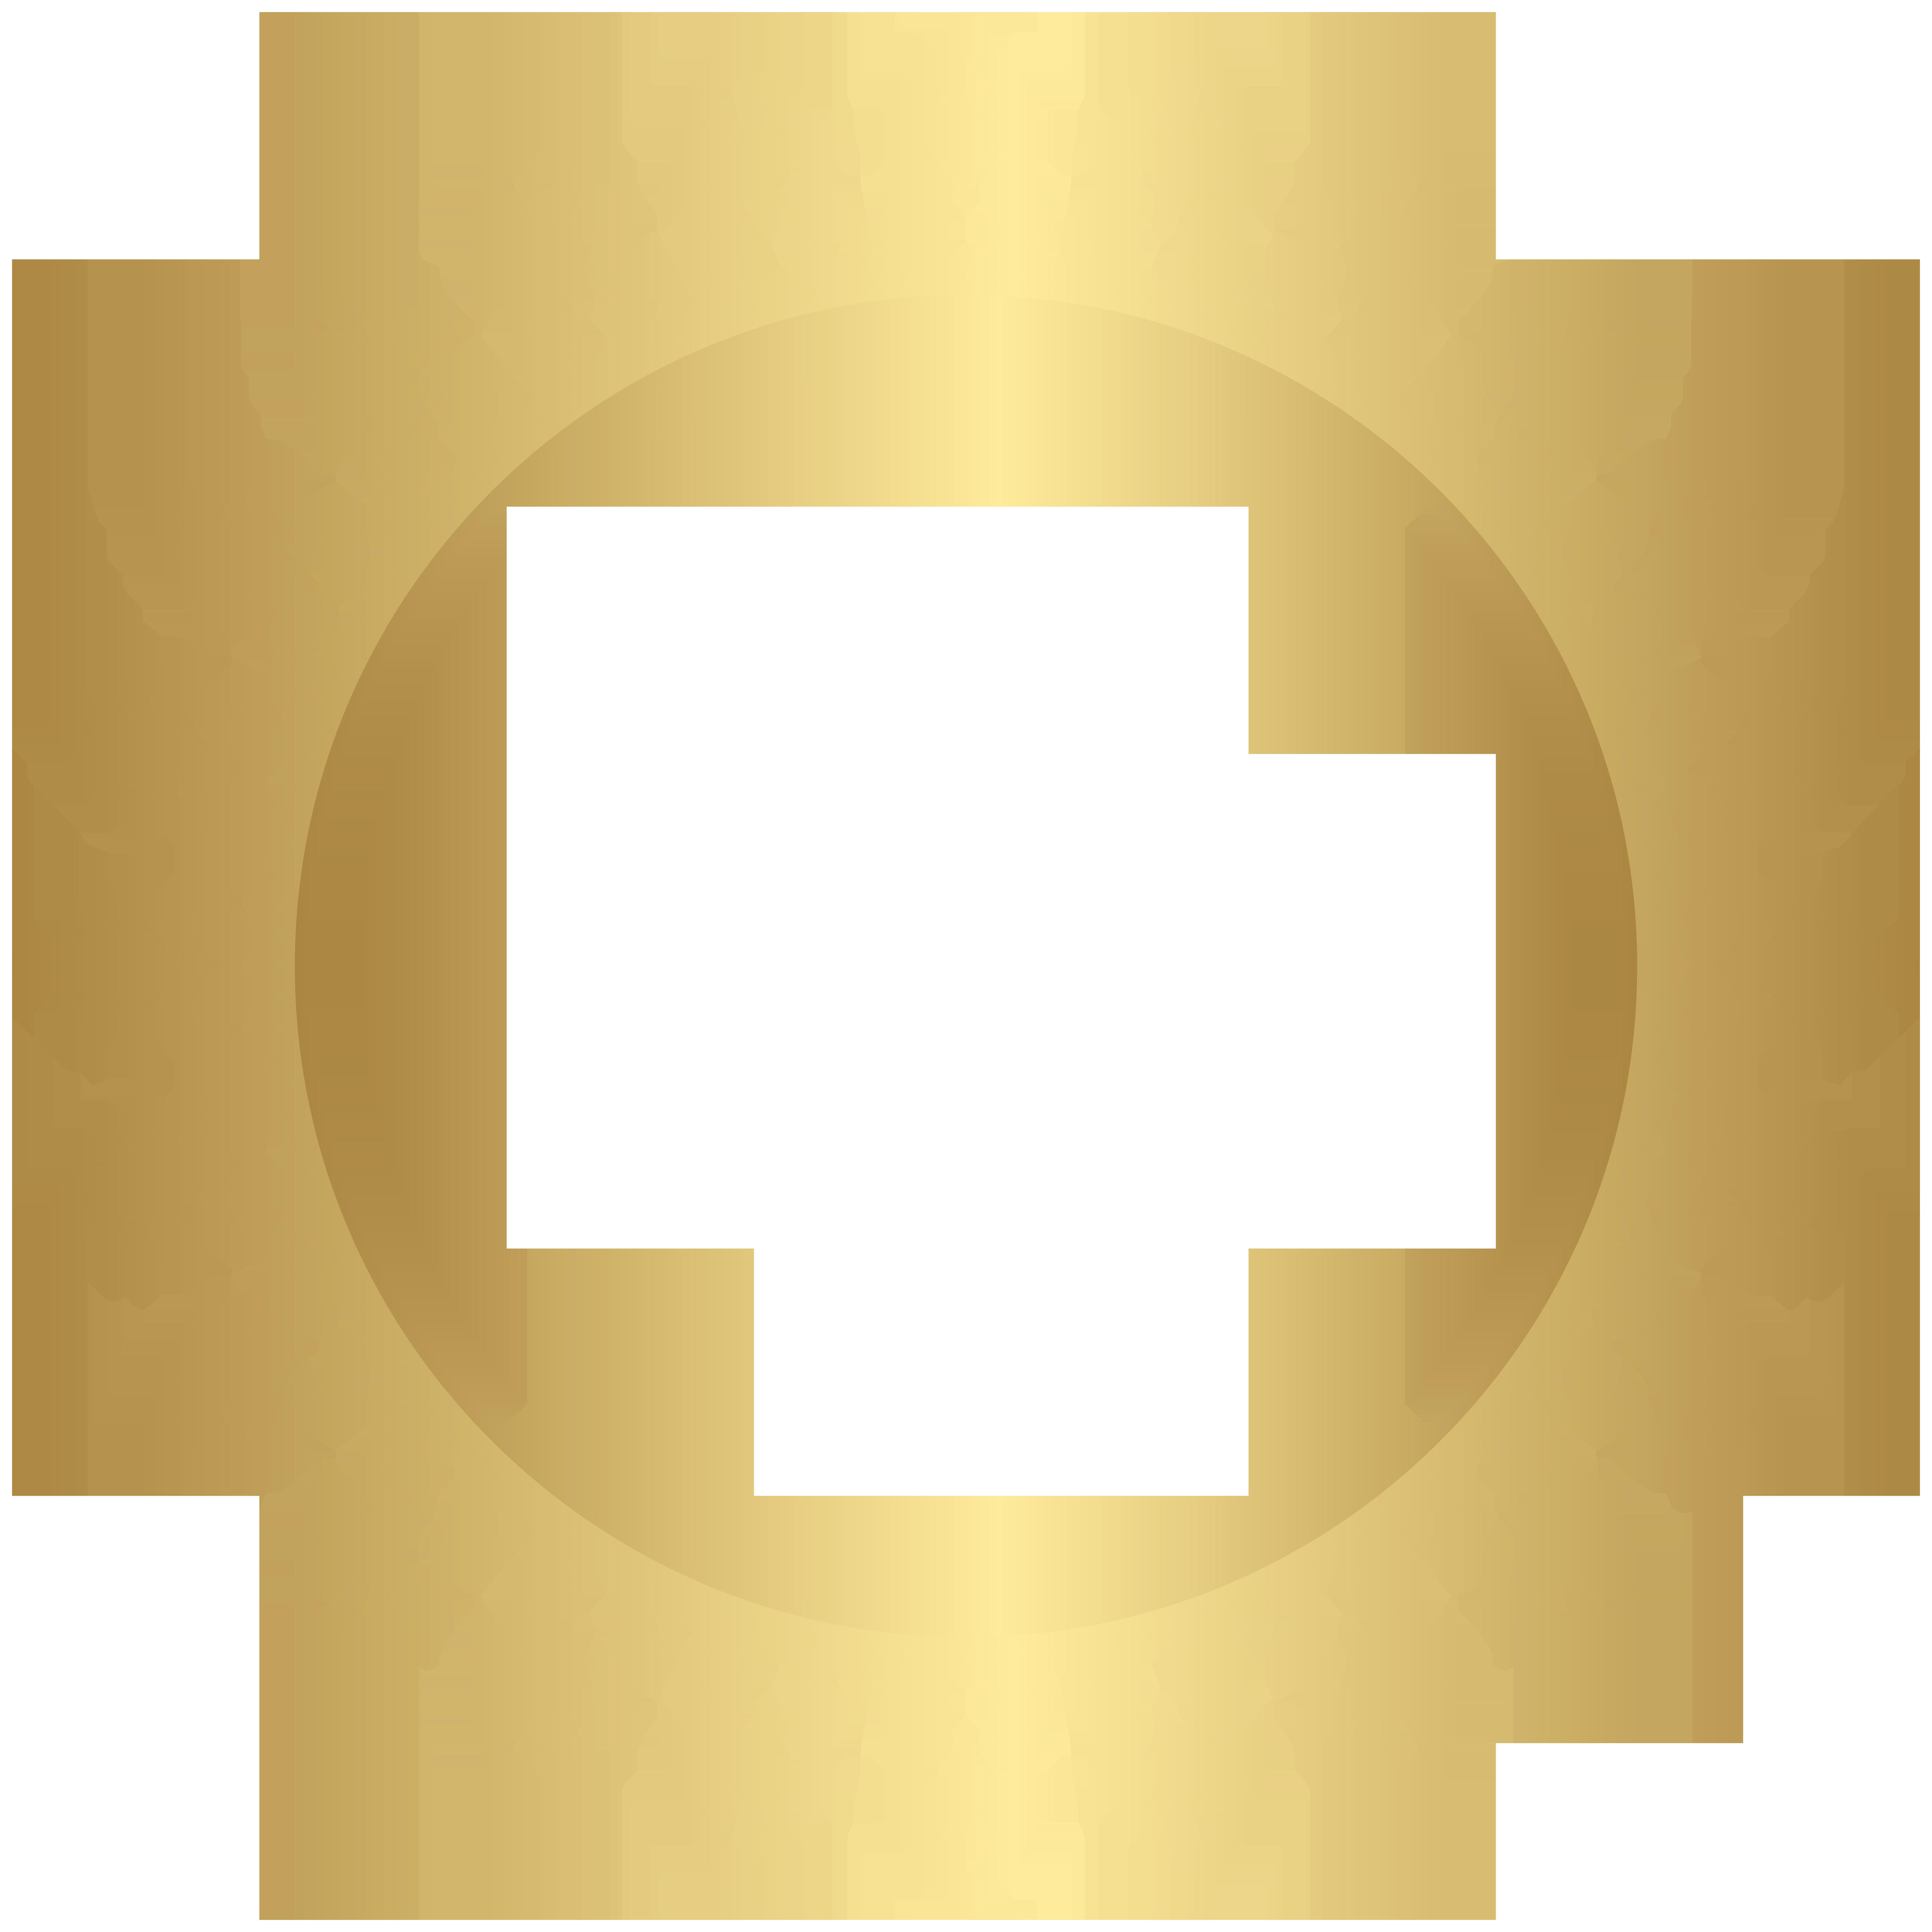 Round Border Frame Clip Art PNG Image.